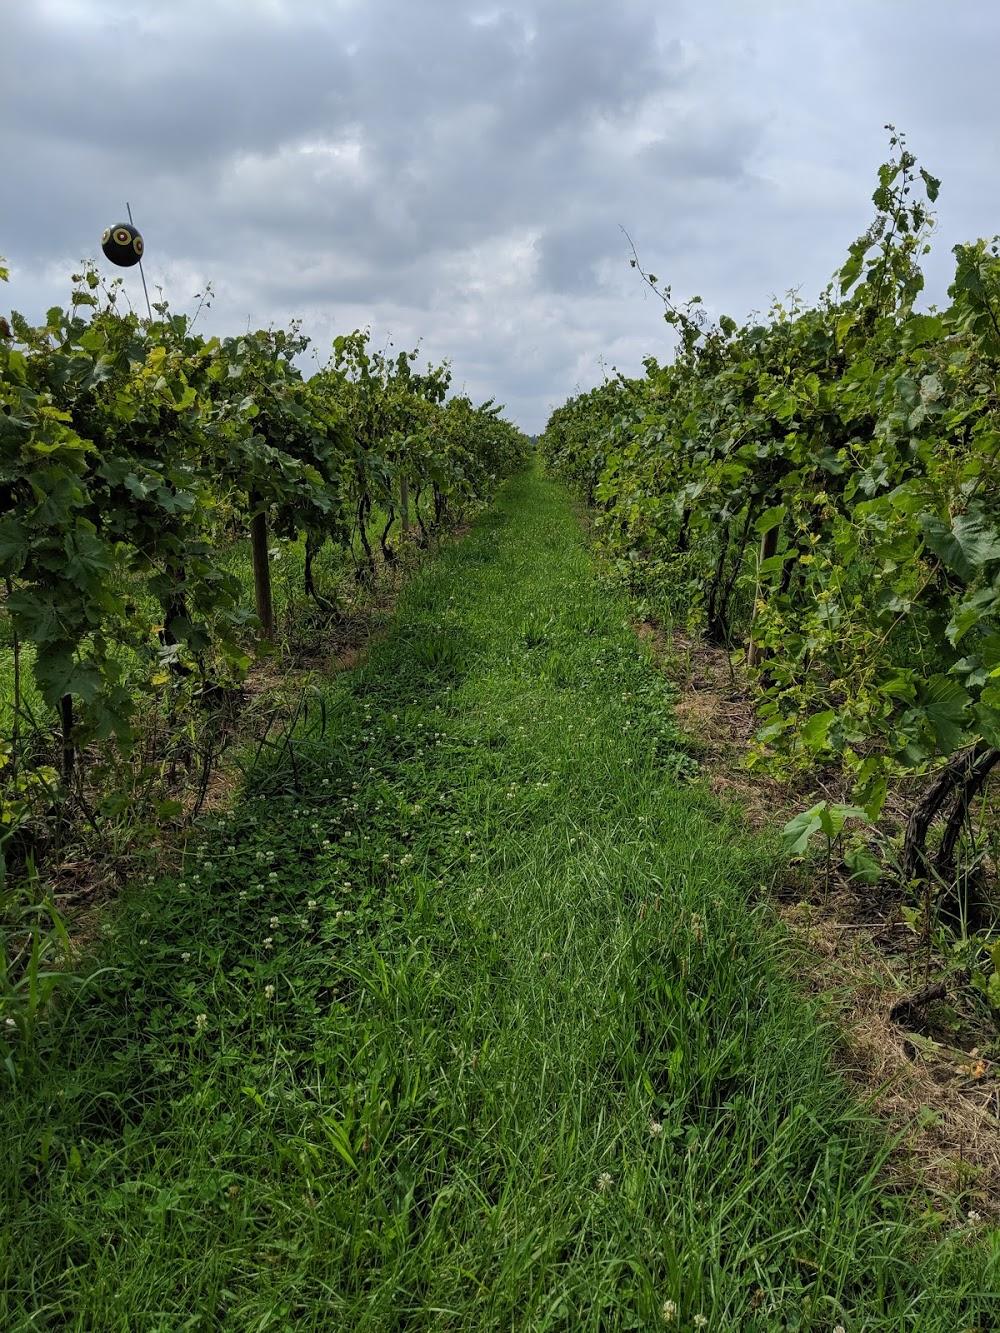 Knapp Winery & The Vineyard Restaurant (Restaurant is seasonal)